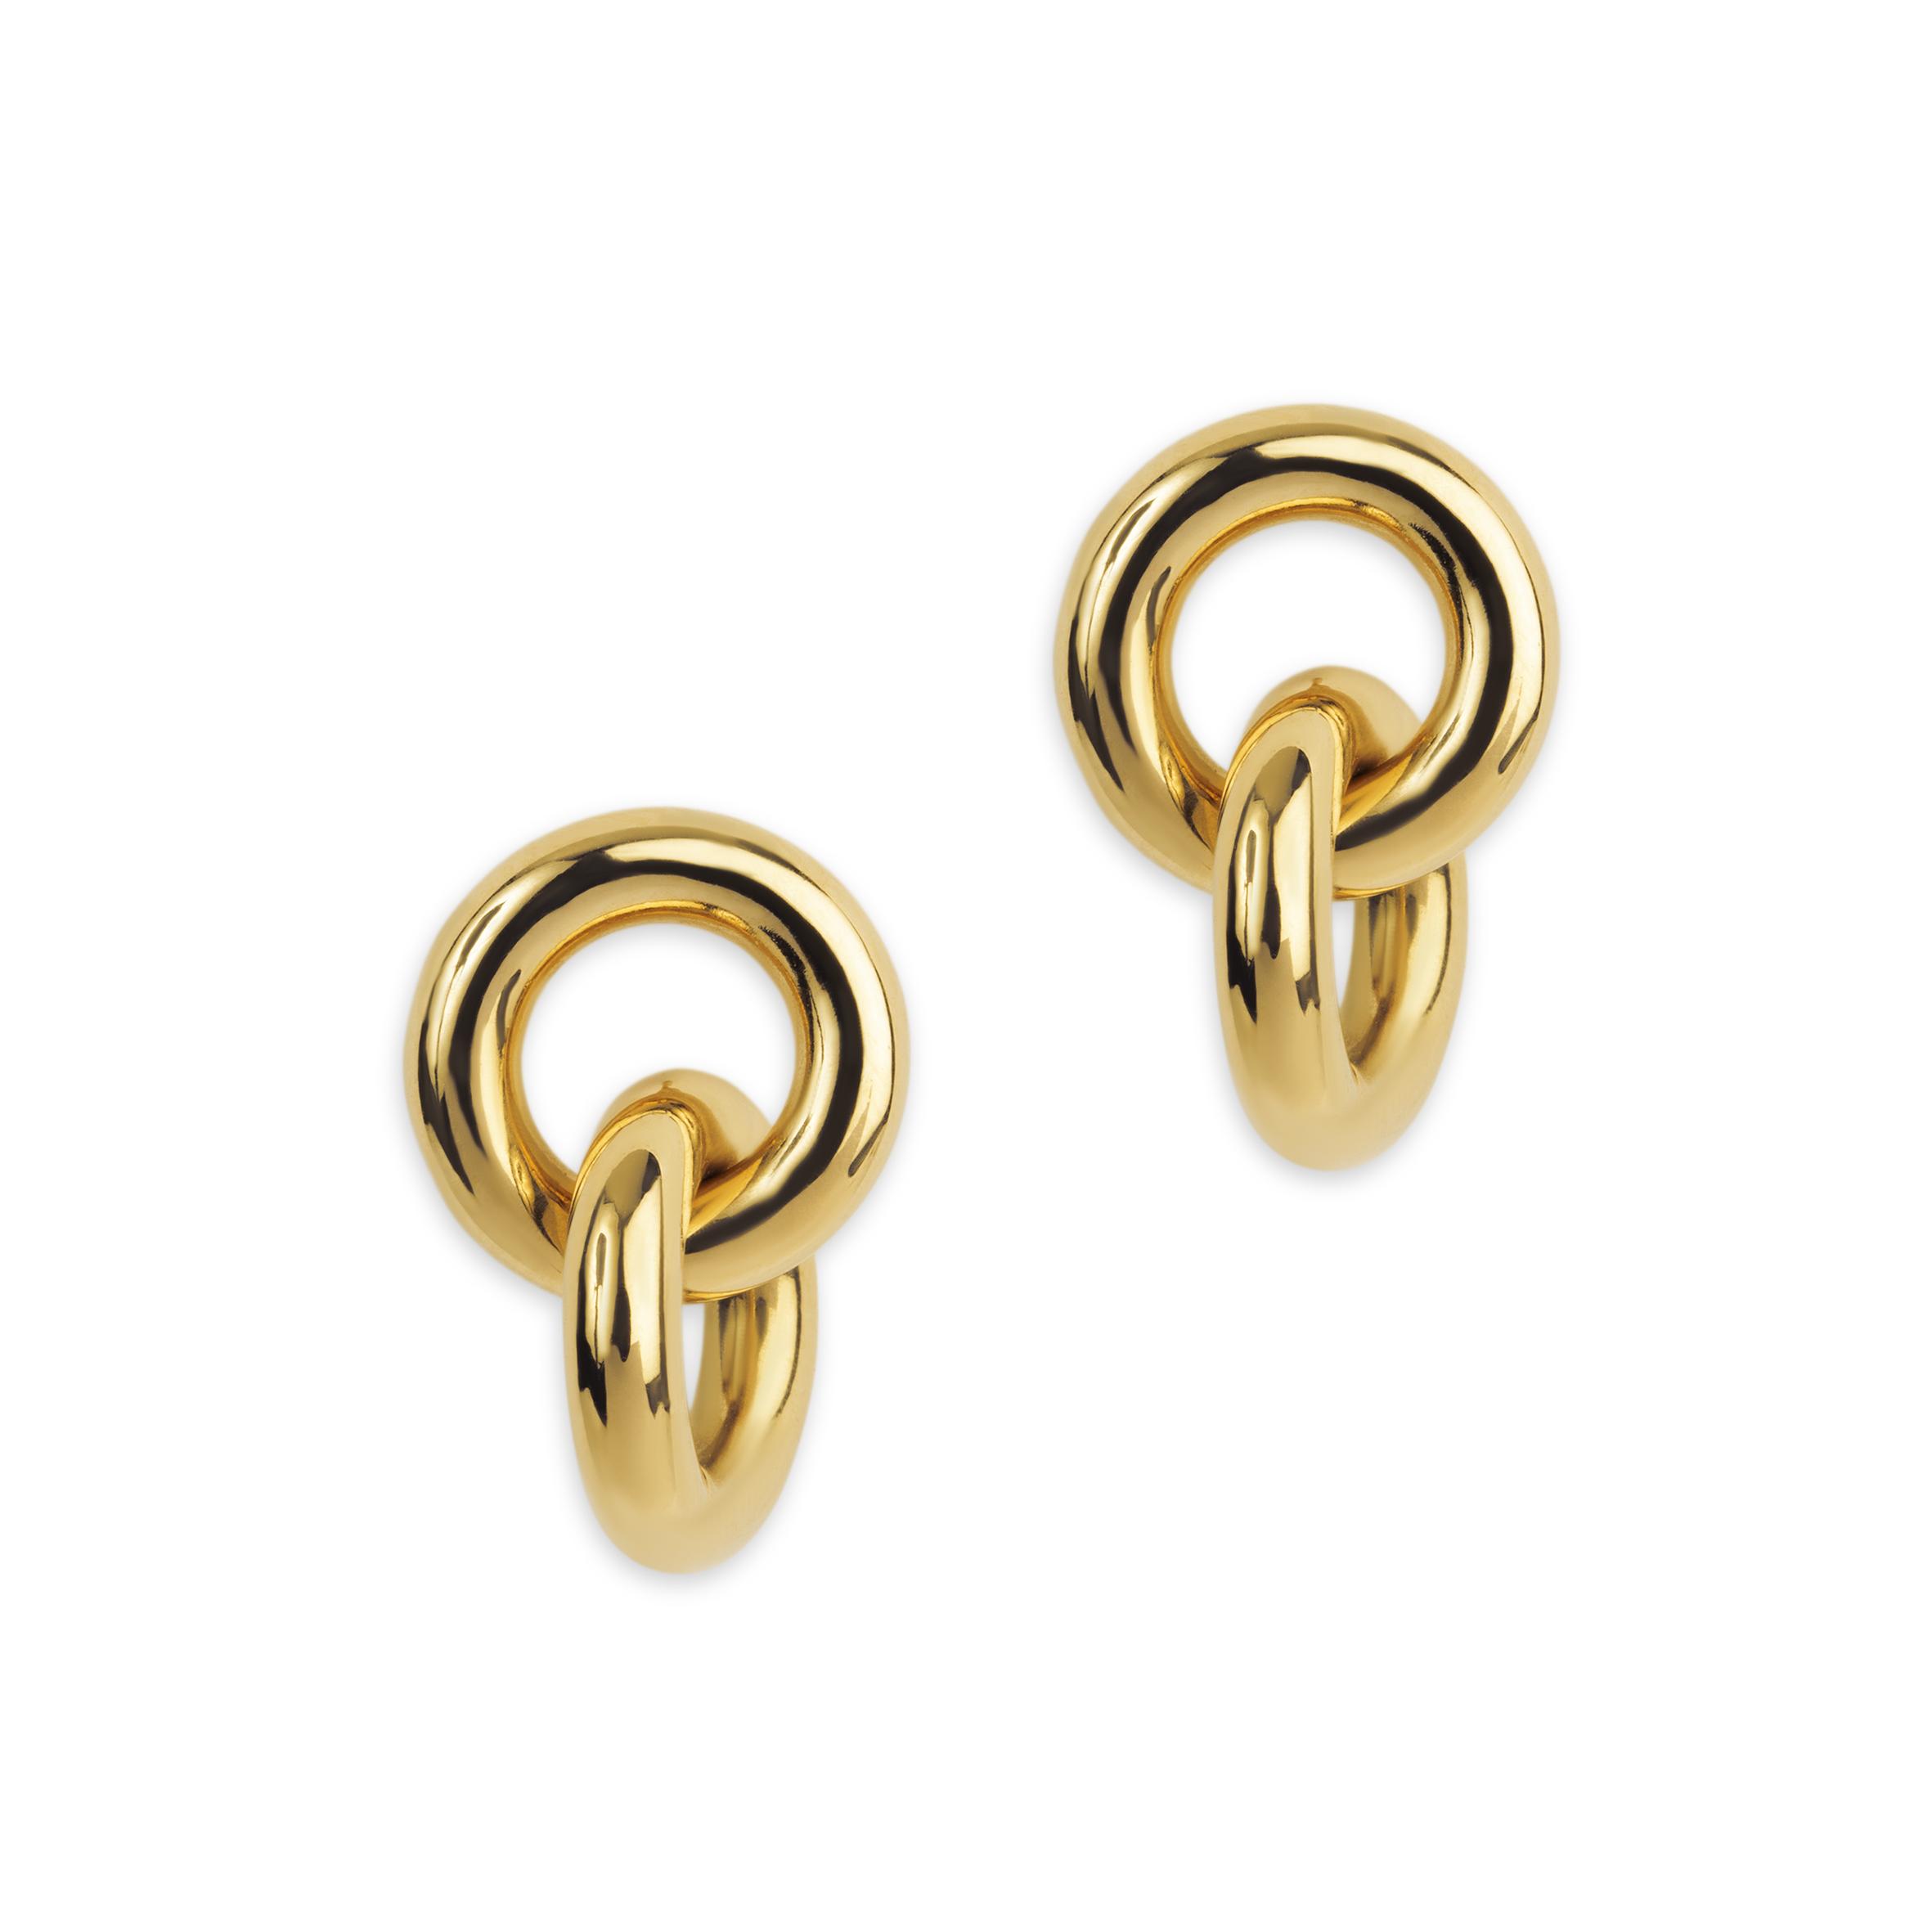 Damsmycke pfg Stockholm Pearls for Girls-Erica Earring 96288-07